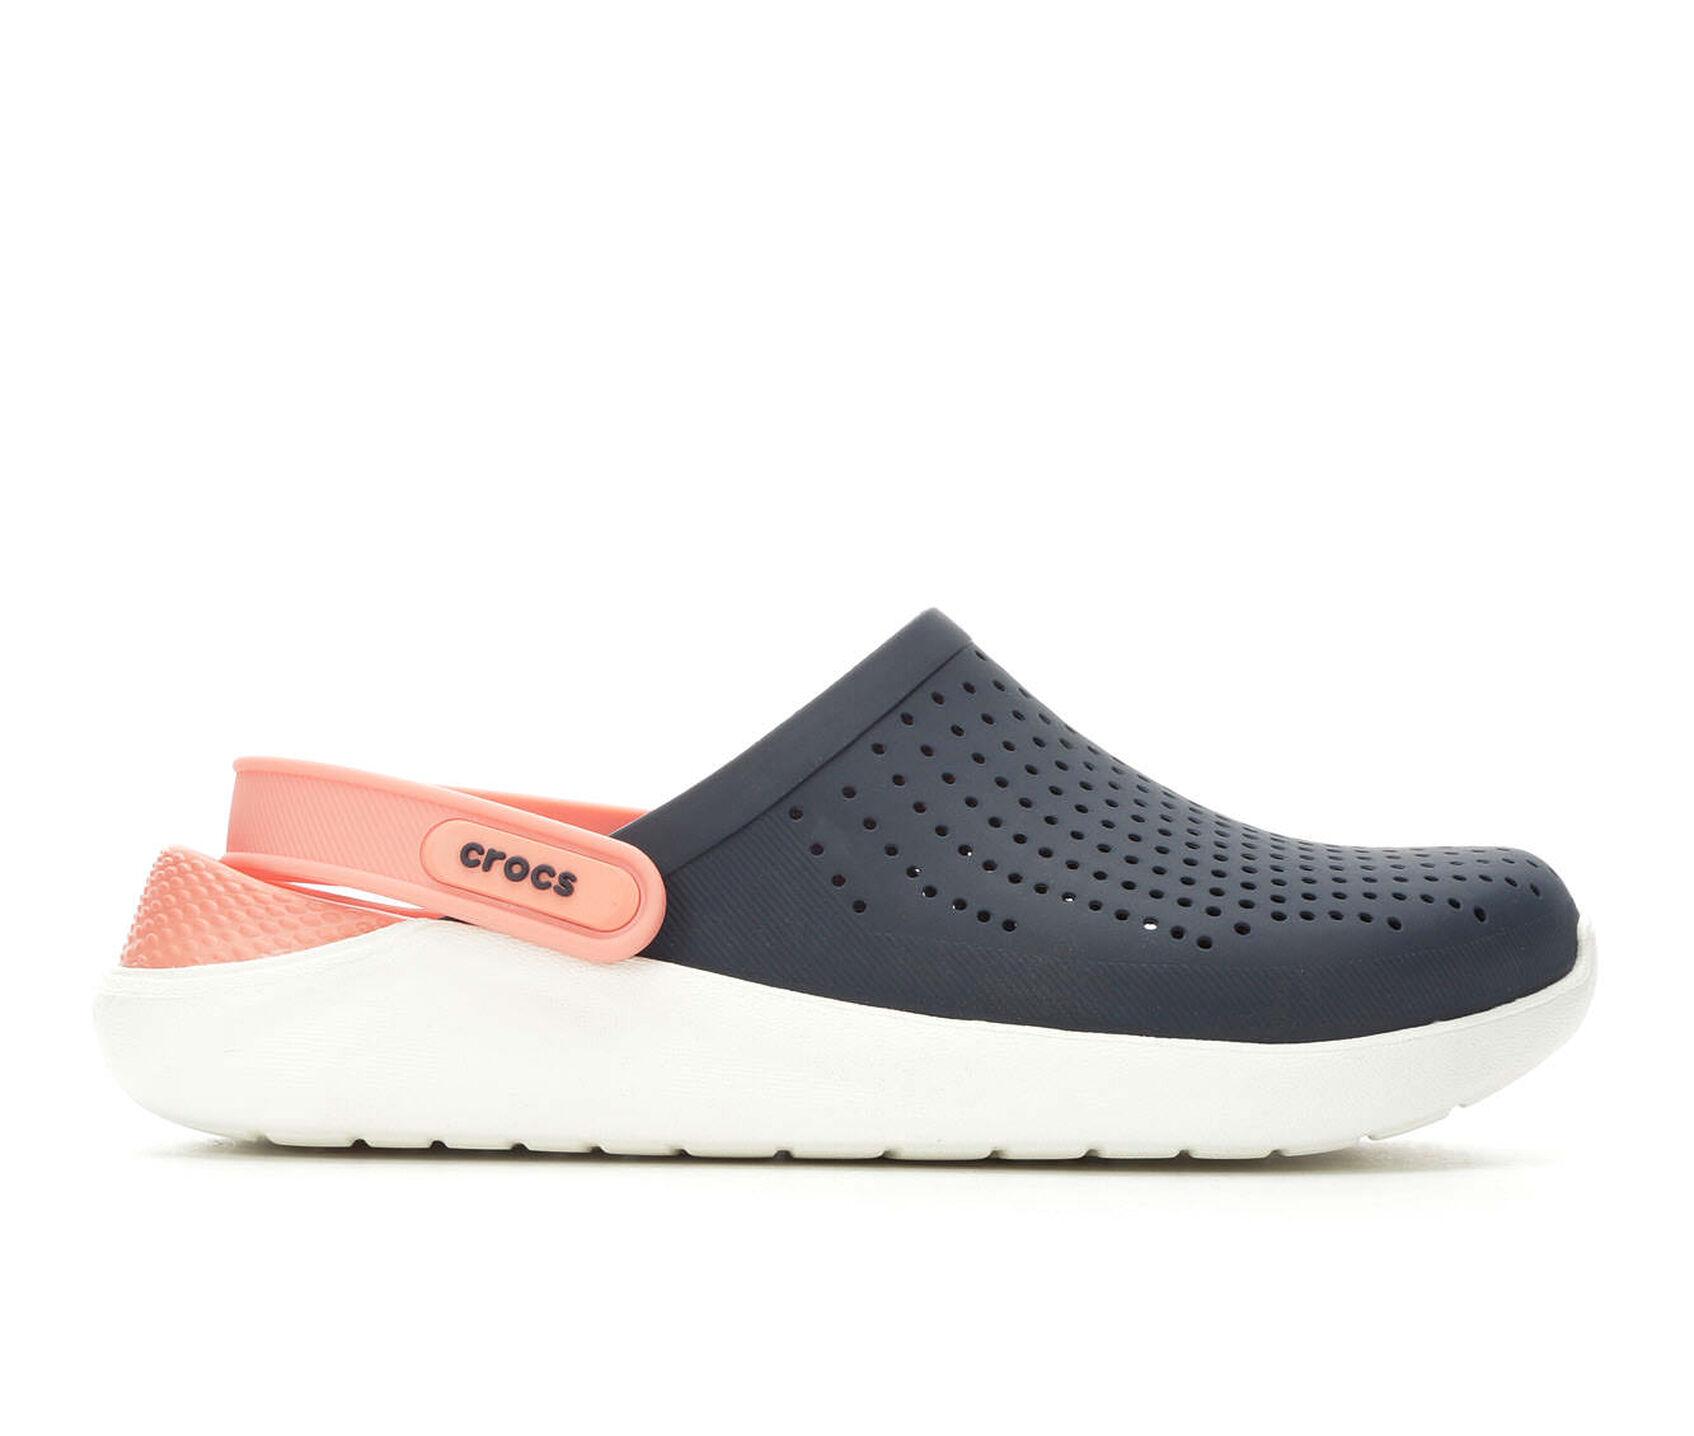 bd86c0be016 Women s Crocs LiteRide Clog